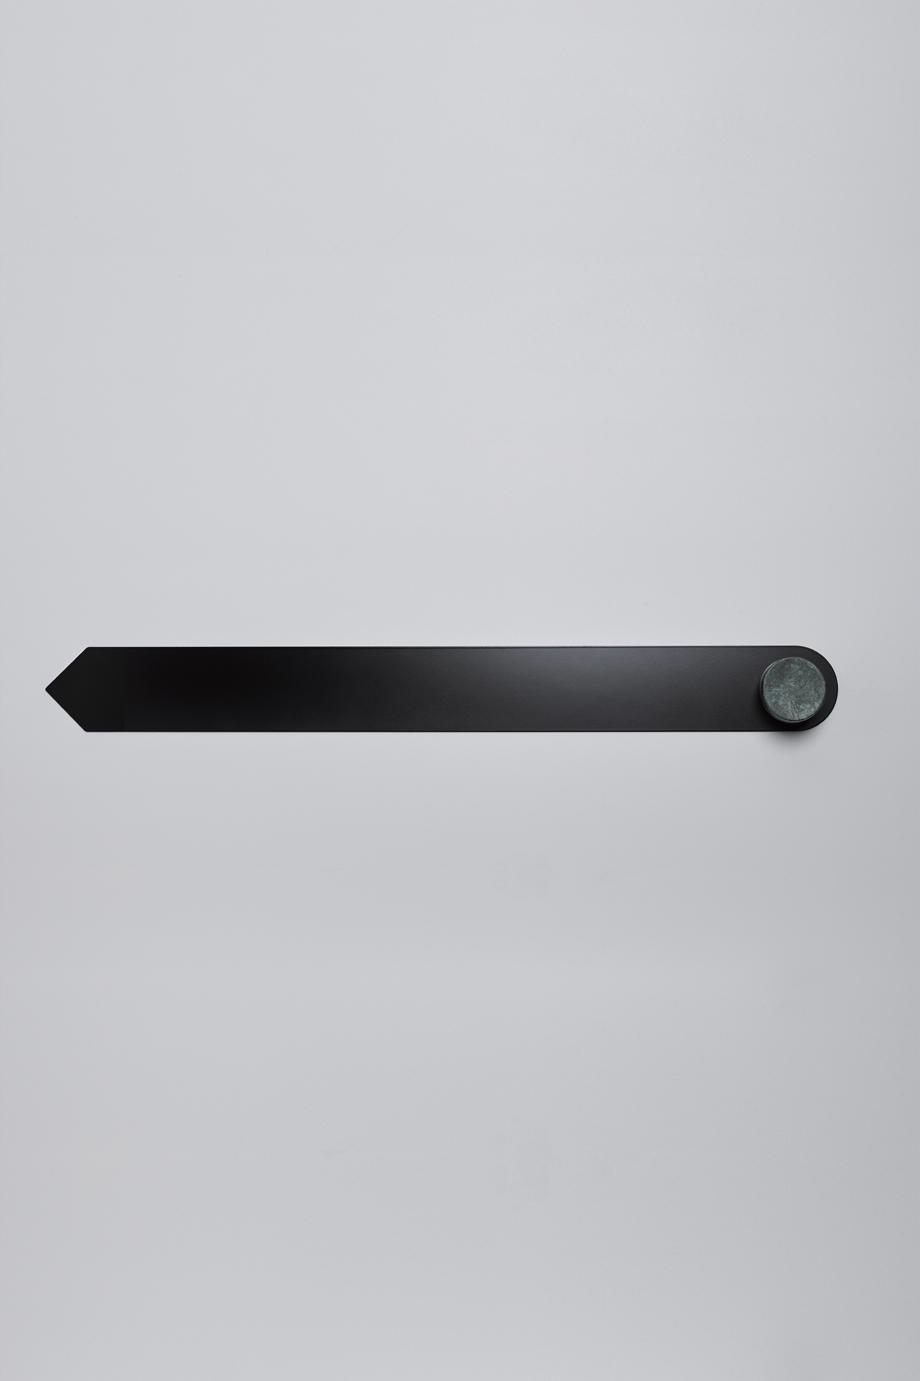 BitPart-Brooke Holm-Megan Morton-Green Marble-Door Knob-Long Tag-Backplate.jpg